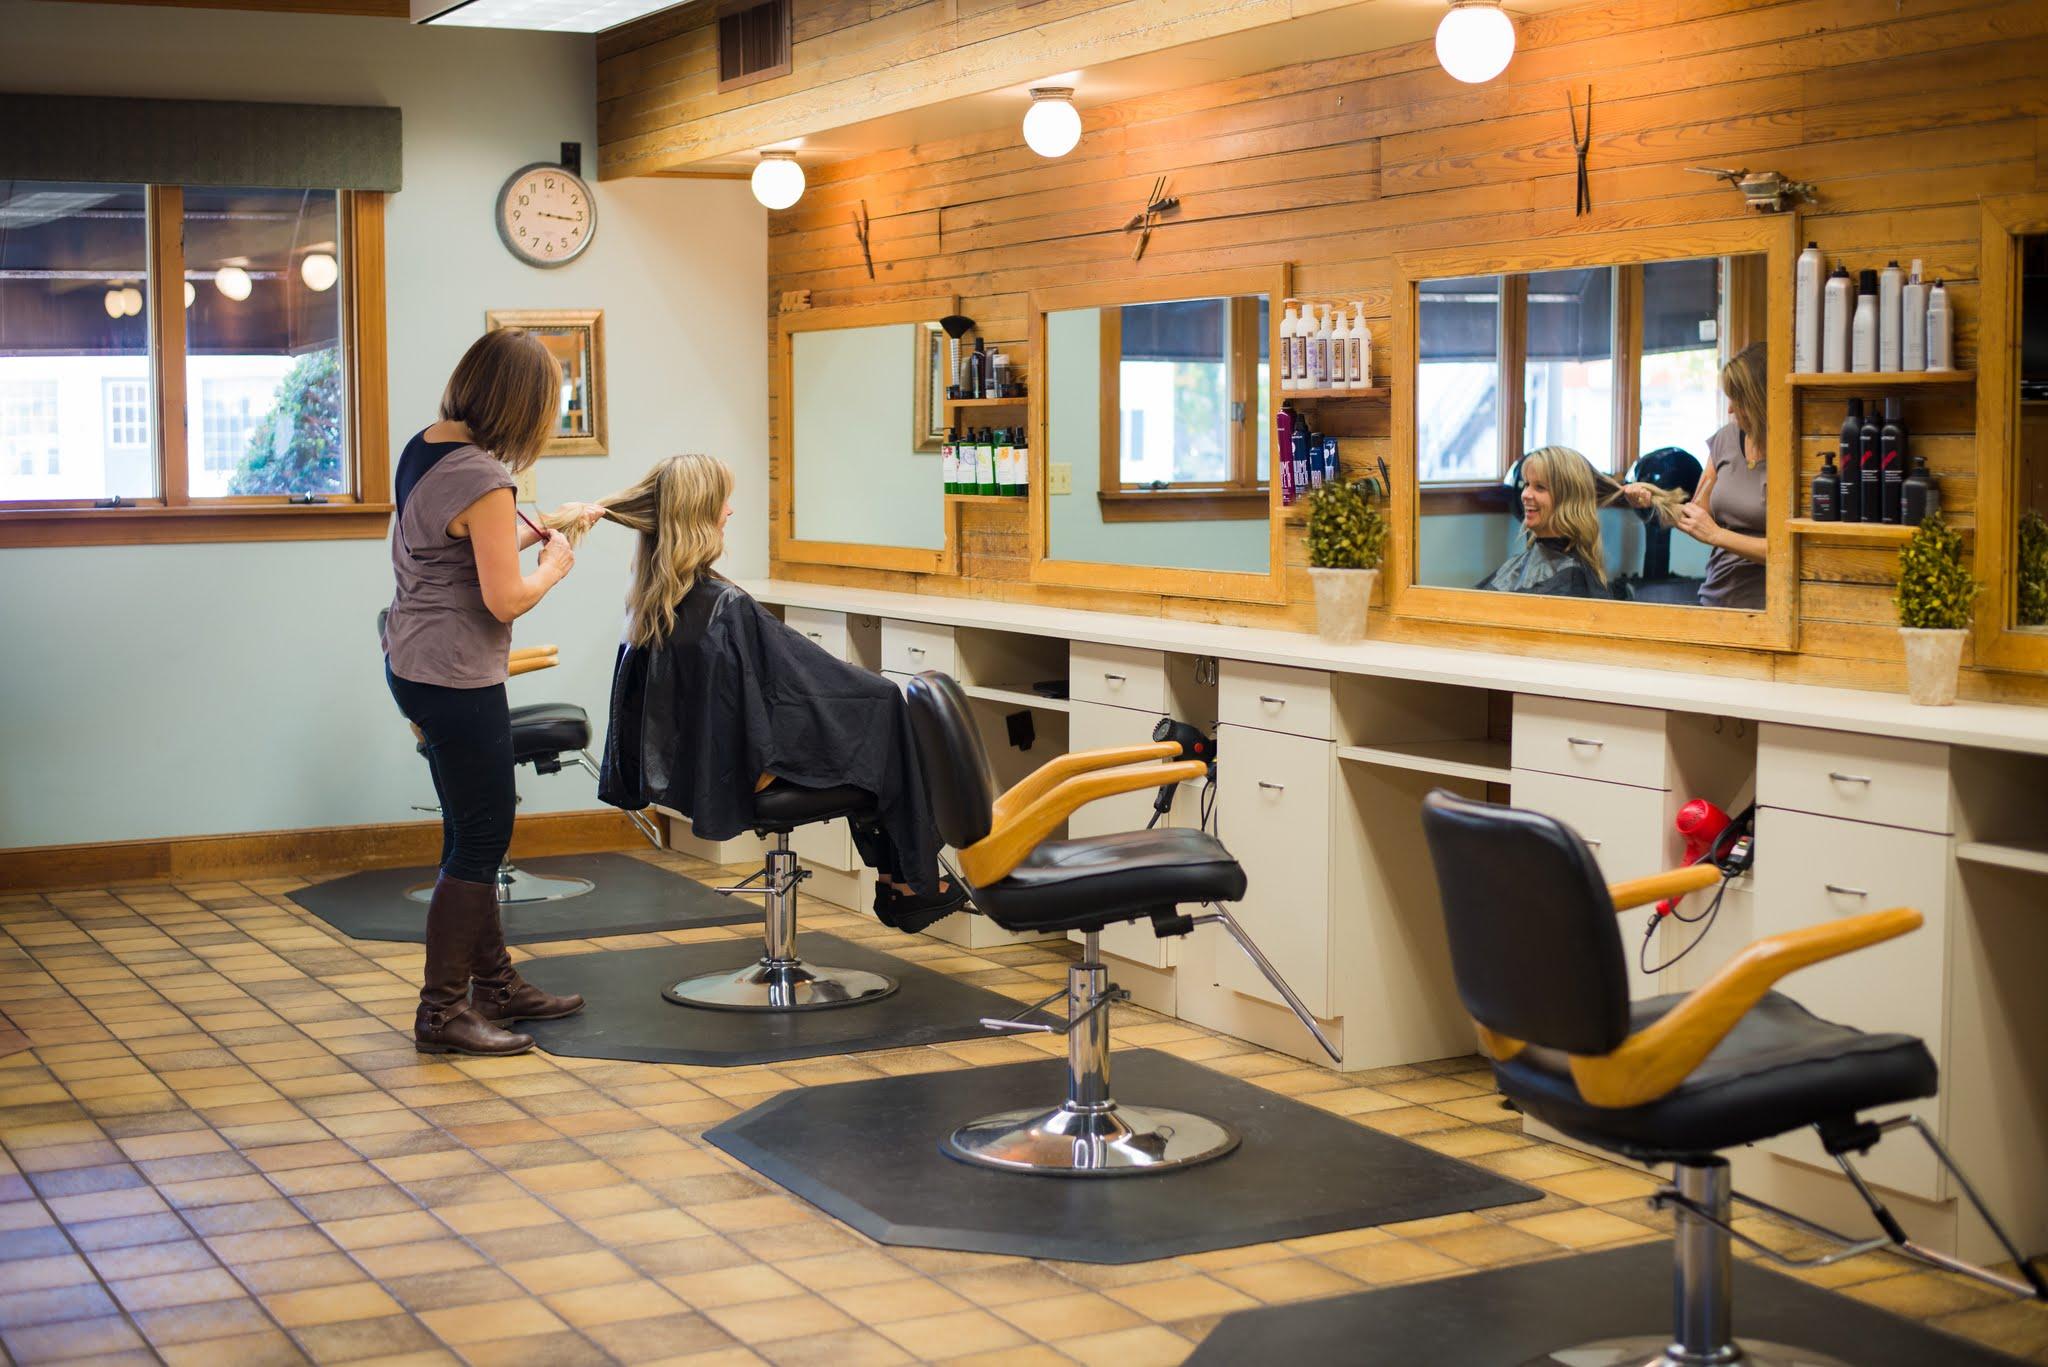 Jon Val Hair Salon in Groveland, MA